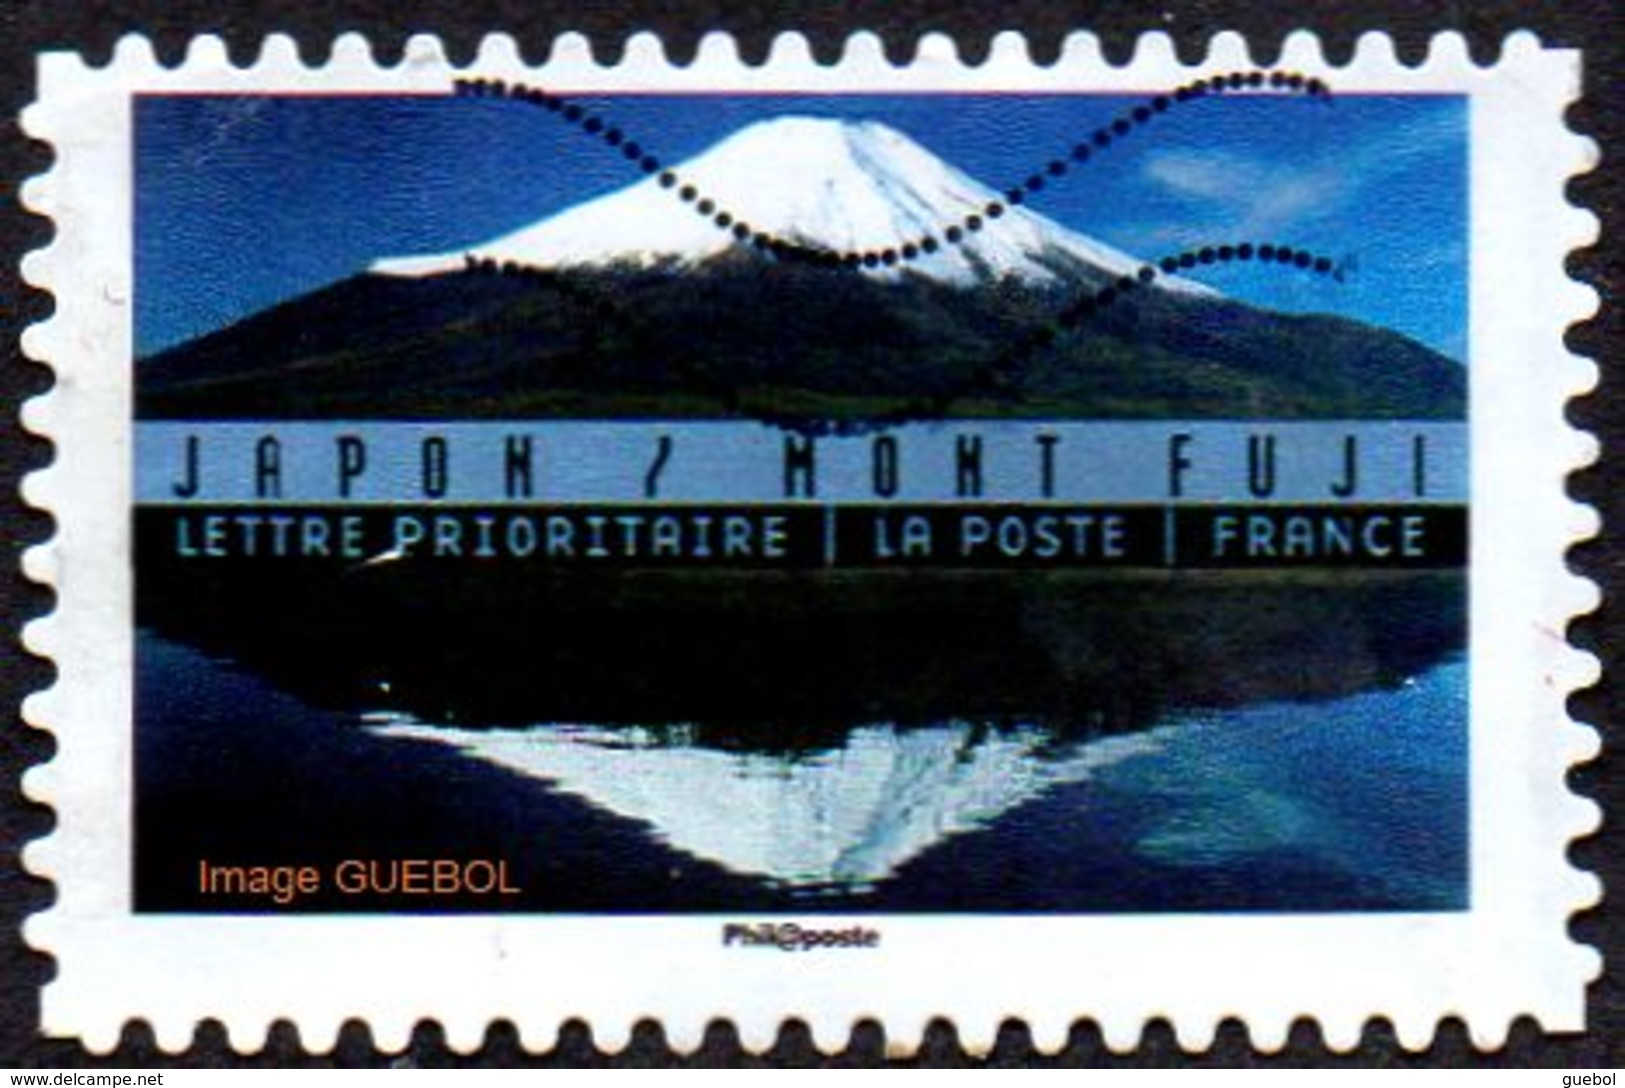 Oblitération Moderne Sur Adhésif De France N° 1366 - Paysages Du Monde - Mont Fuji (Japon) - France